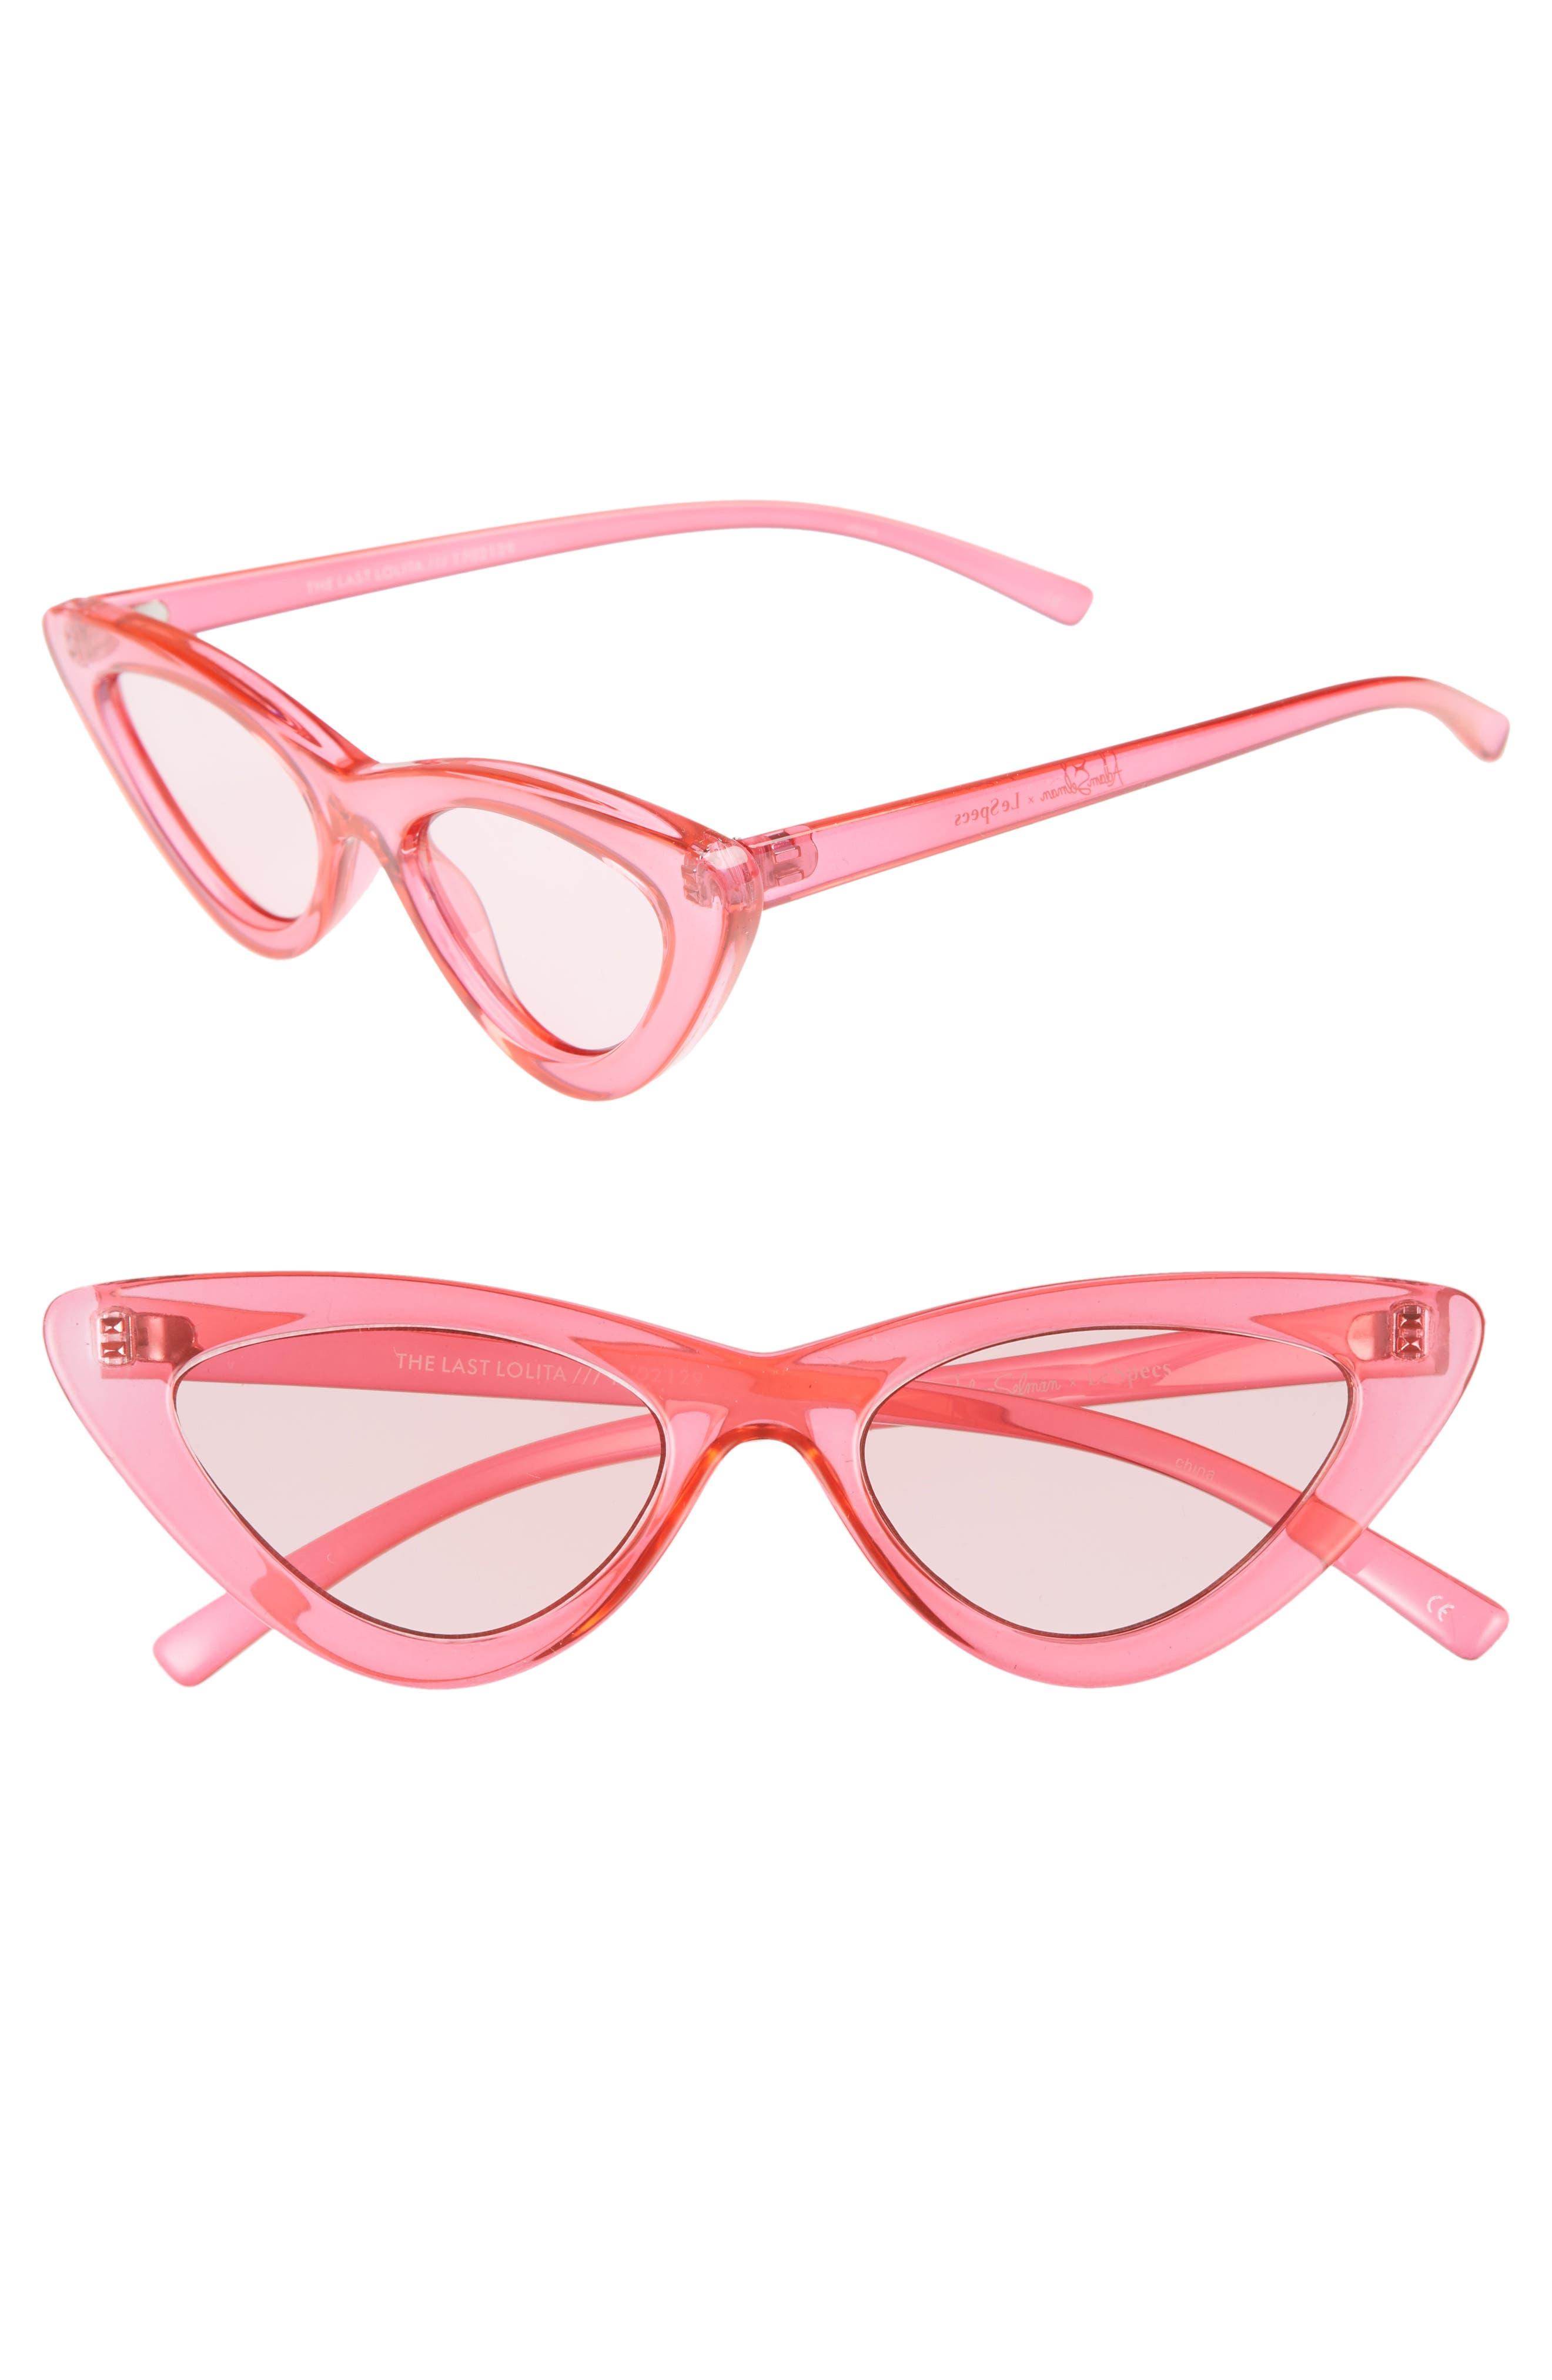 Main Image - Le Specs x Adam Selman Last Lolita 49mm Cat Eye Sunglasses